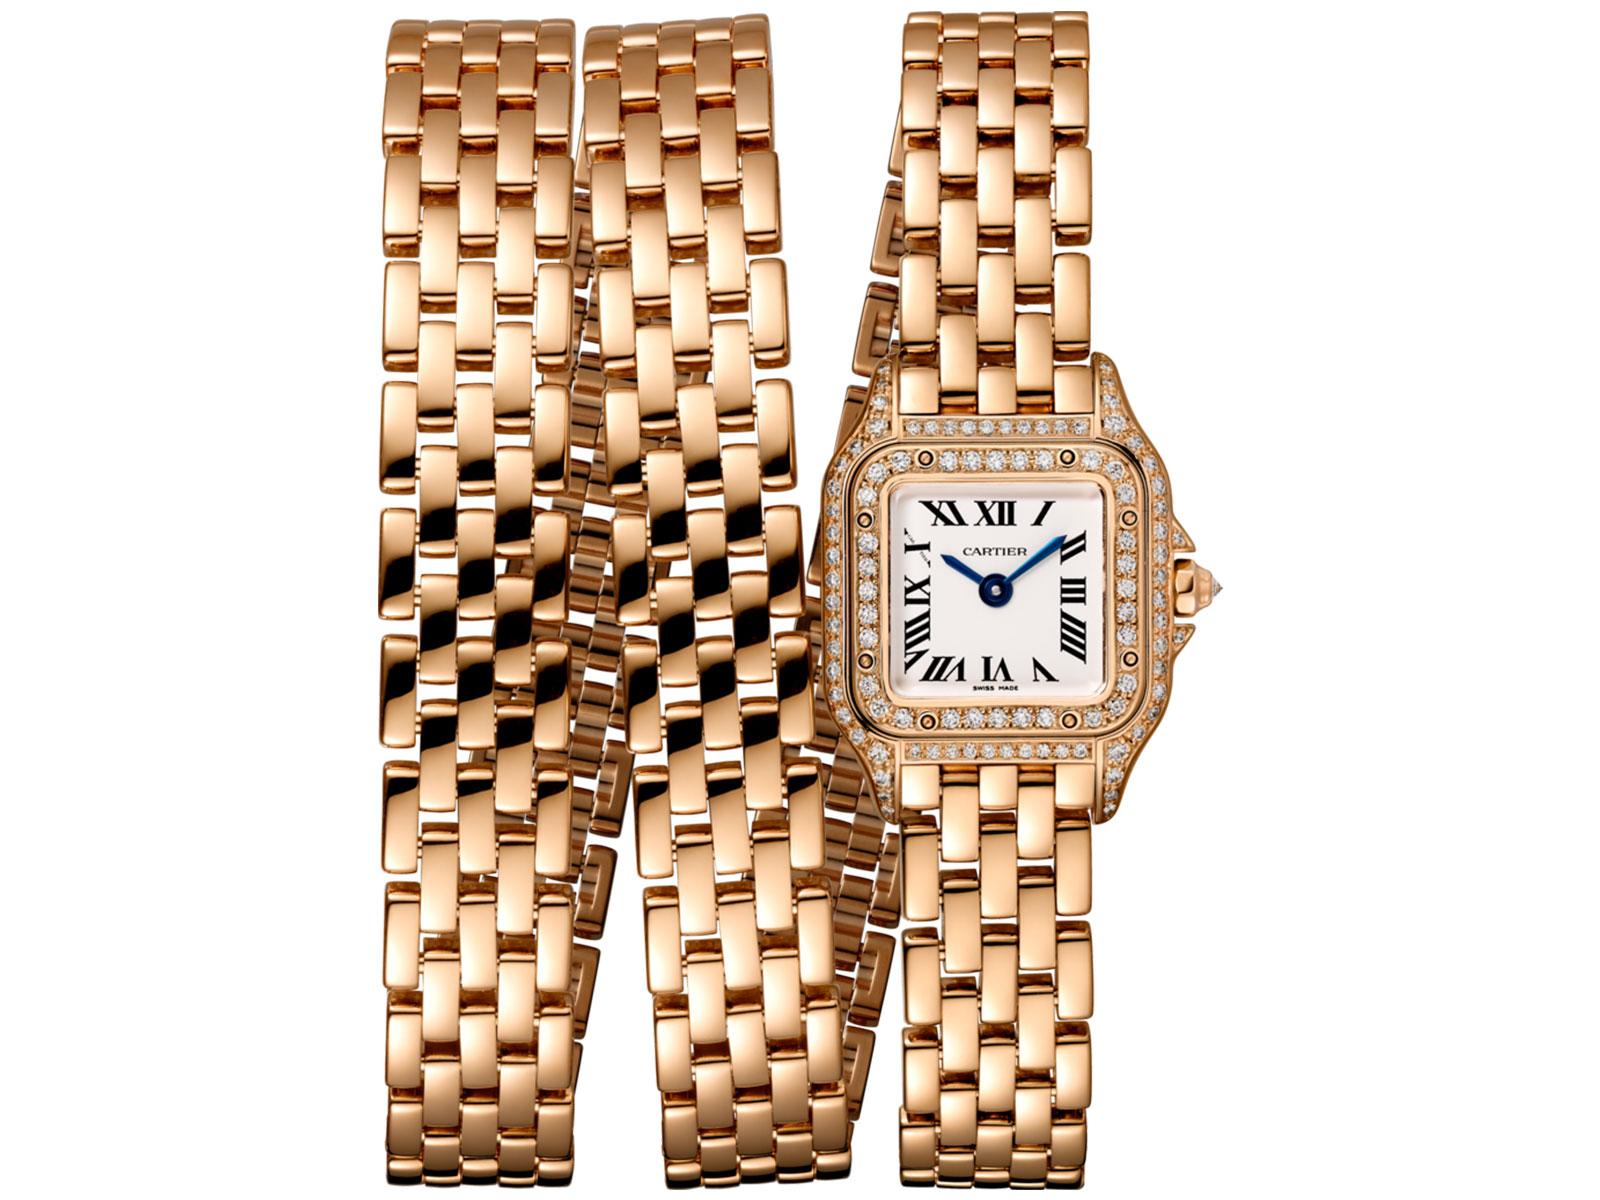 Panthere-de-Cartier-Watch-Collection-2-1.jpg